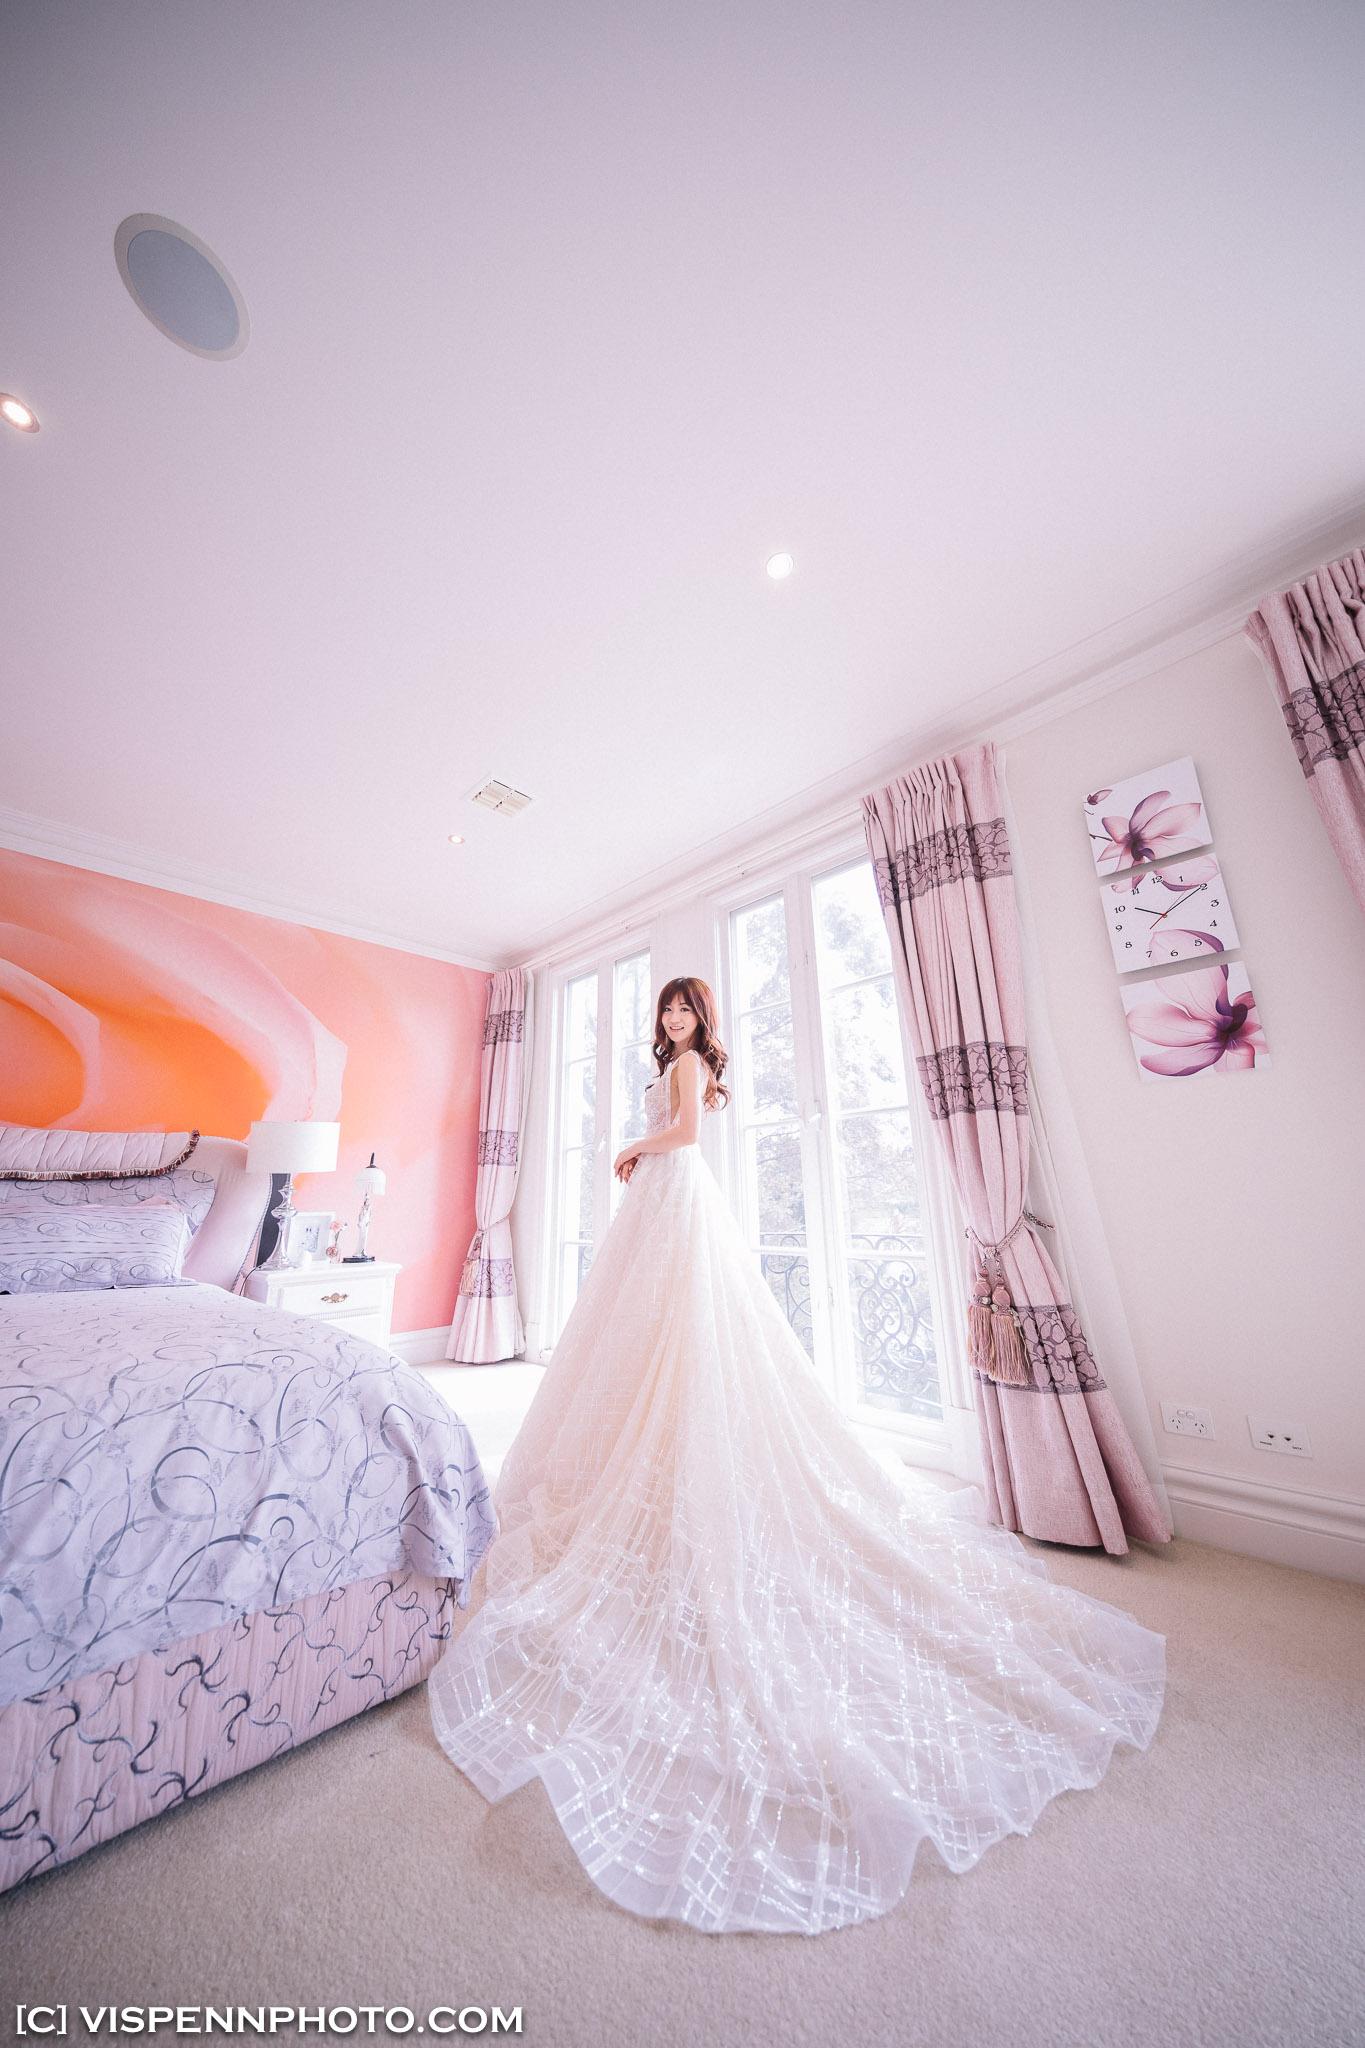 WEDDING DAY Photography Melbourne ZHPENN 0039 5D4 1282